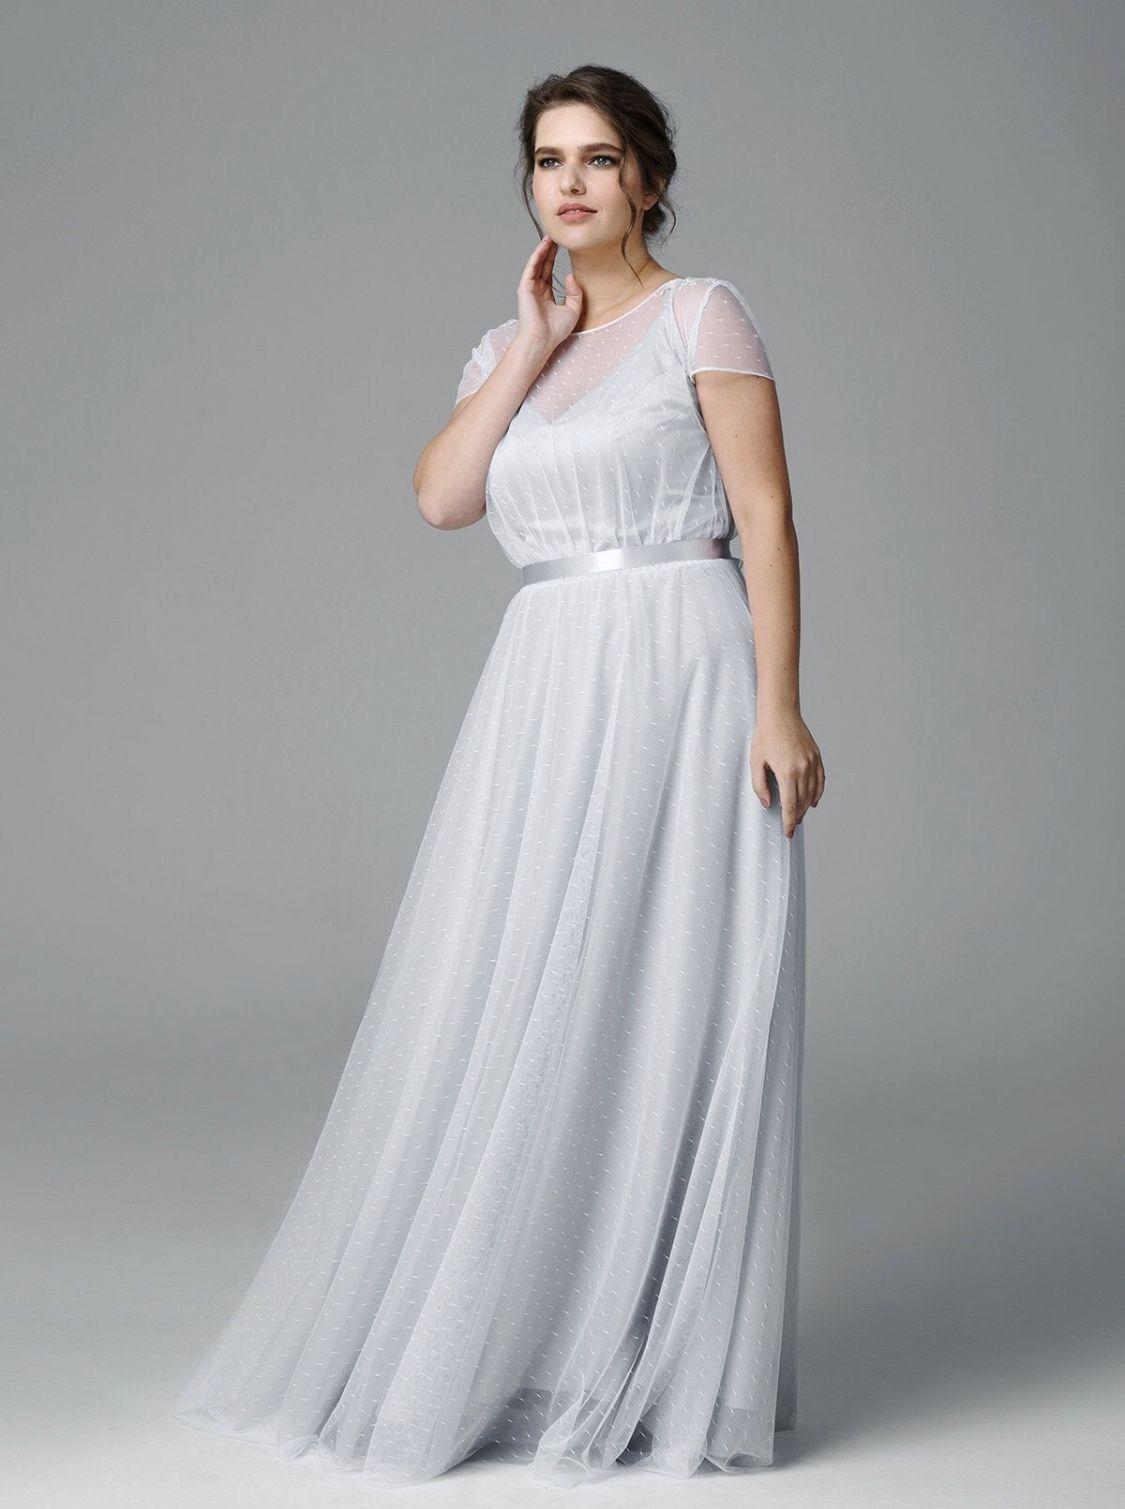 Plus Size Hochzeitskleid, Farbe Tüll Brautkleid, Brautkleid